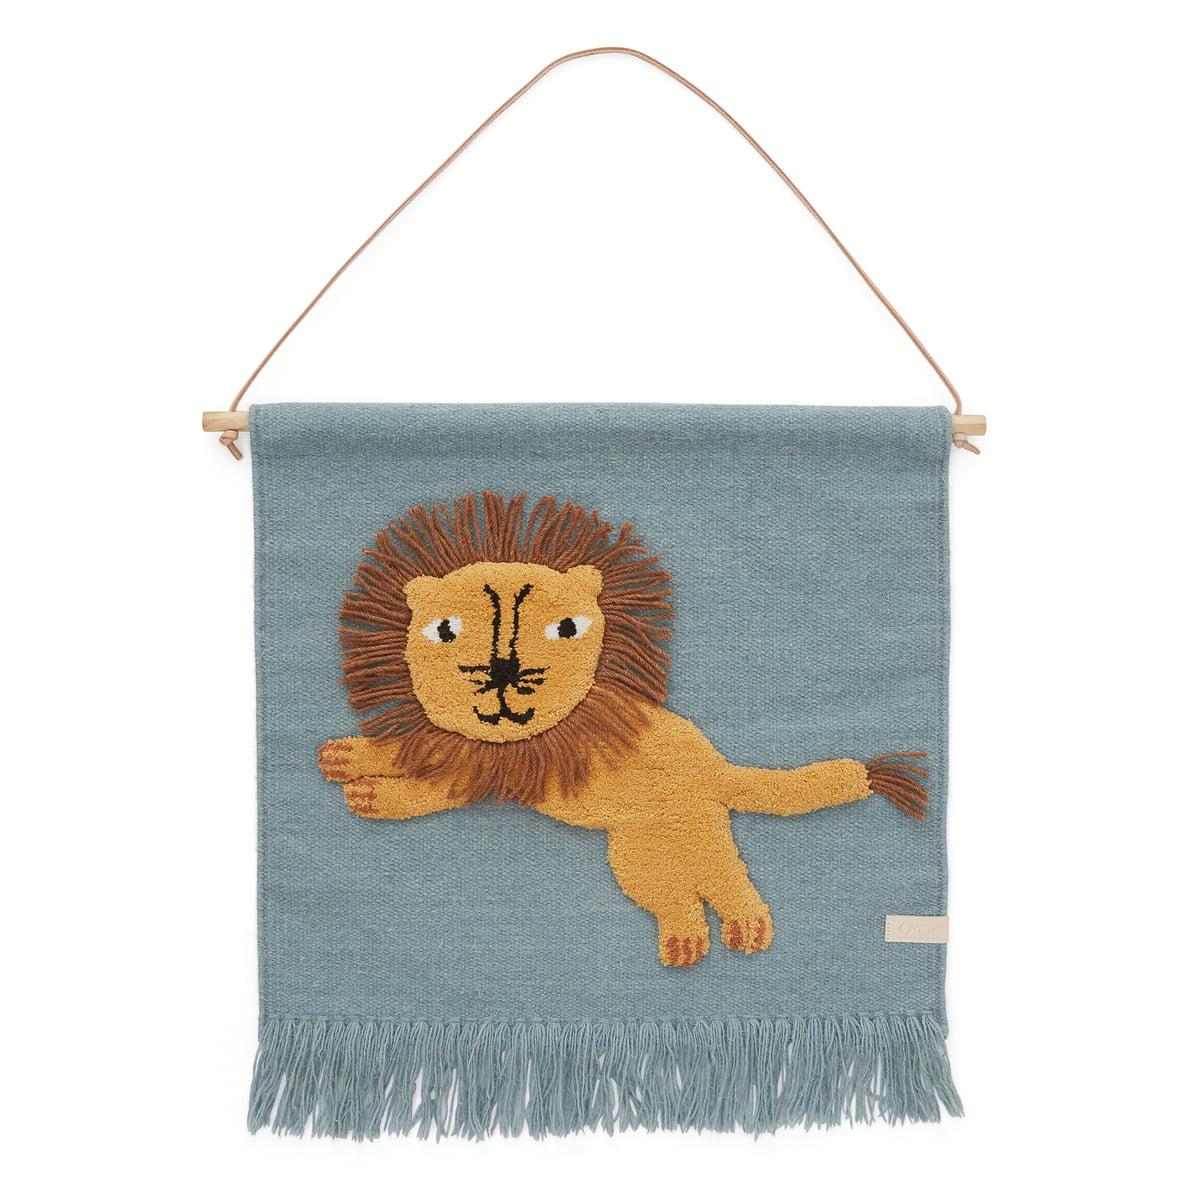 OYOY - Kinder-Wandteppich mit Tiermotiv, Löwe / tourmaline